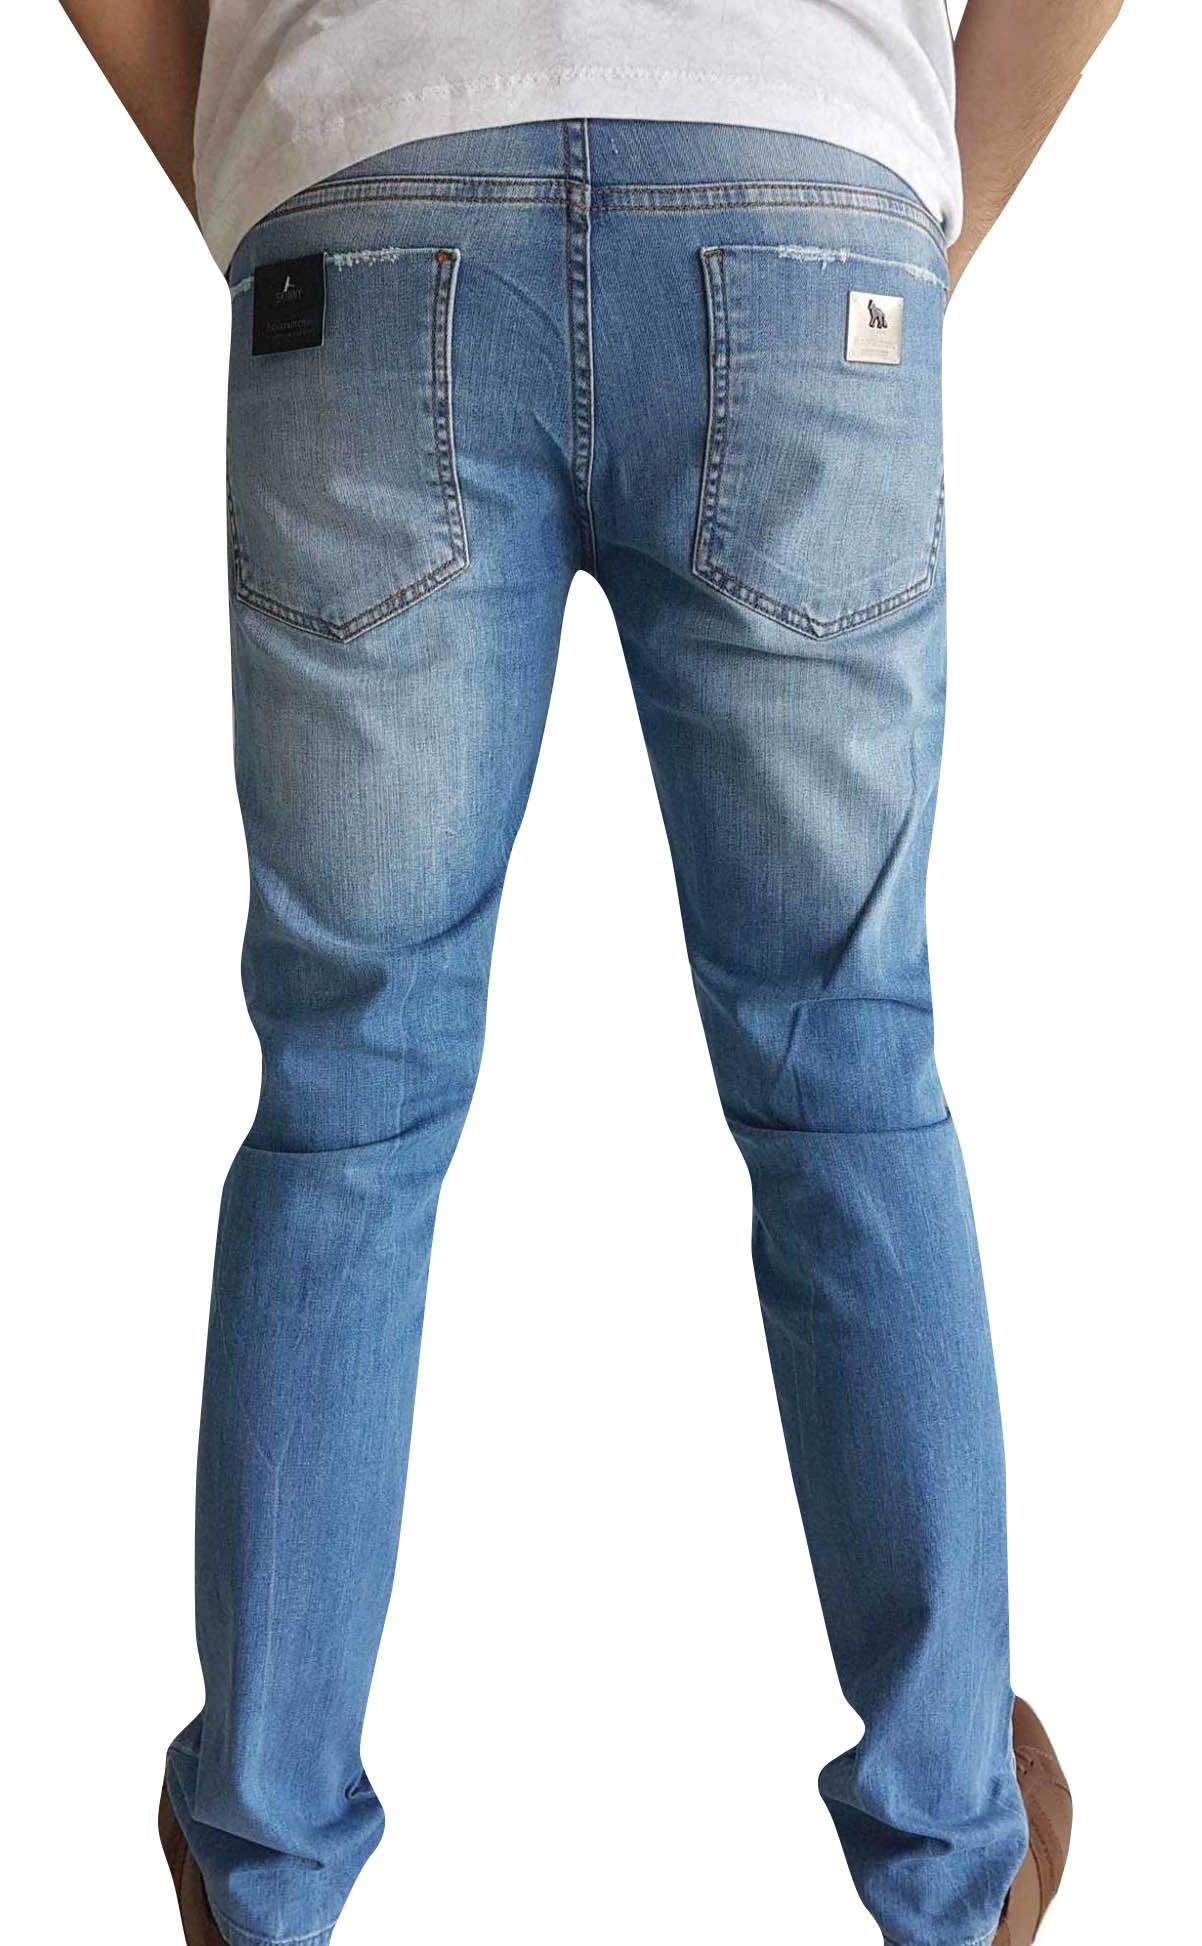 Calça Acostamento Masculina Jeans Conforto